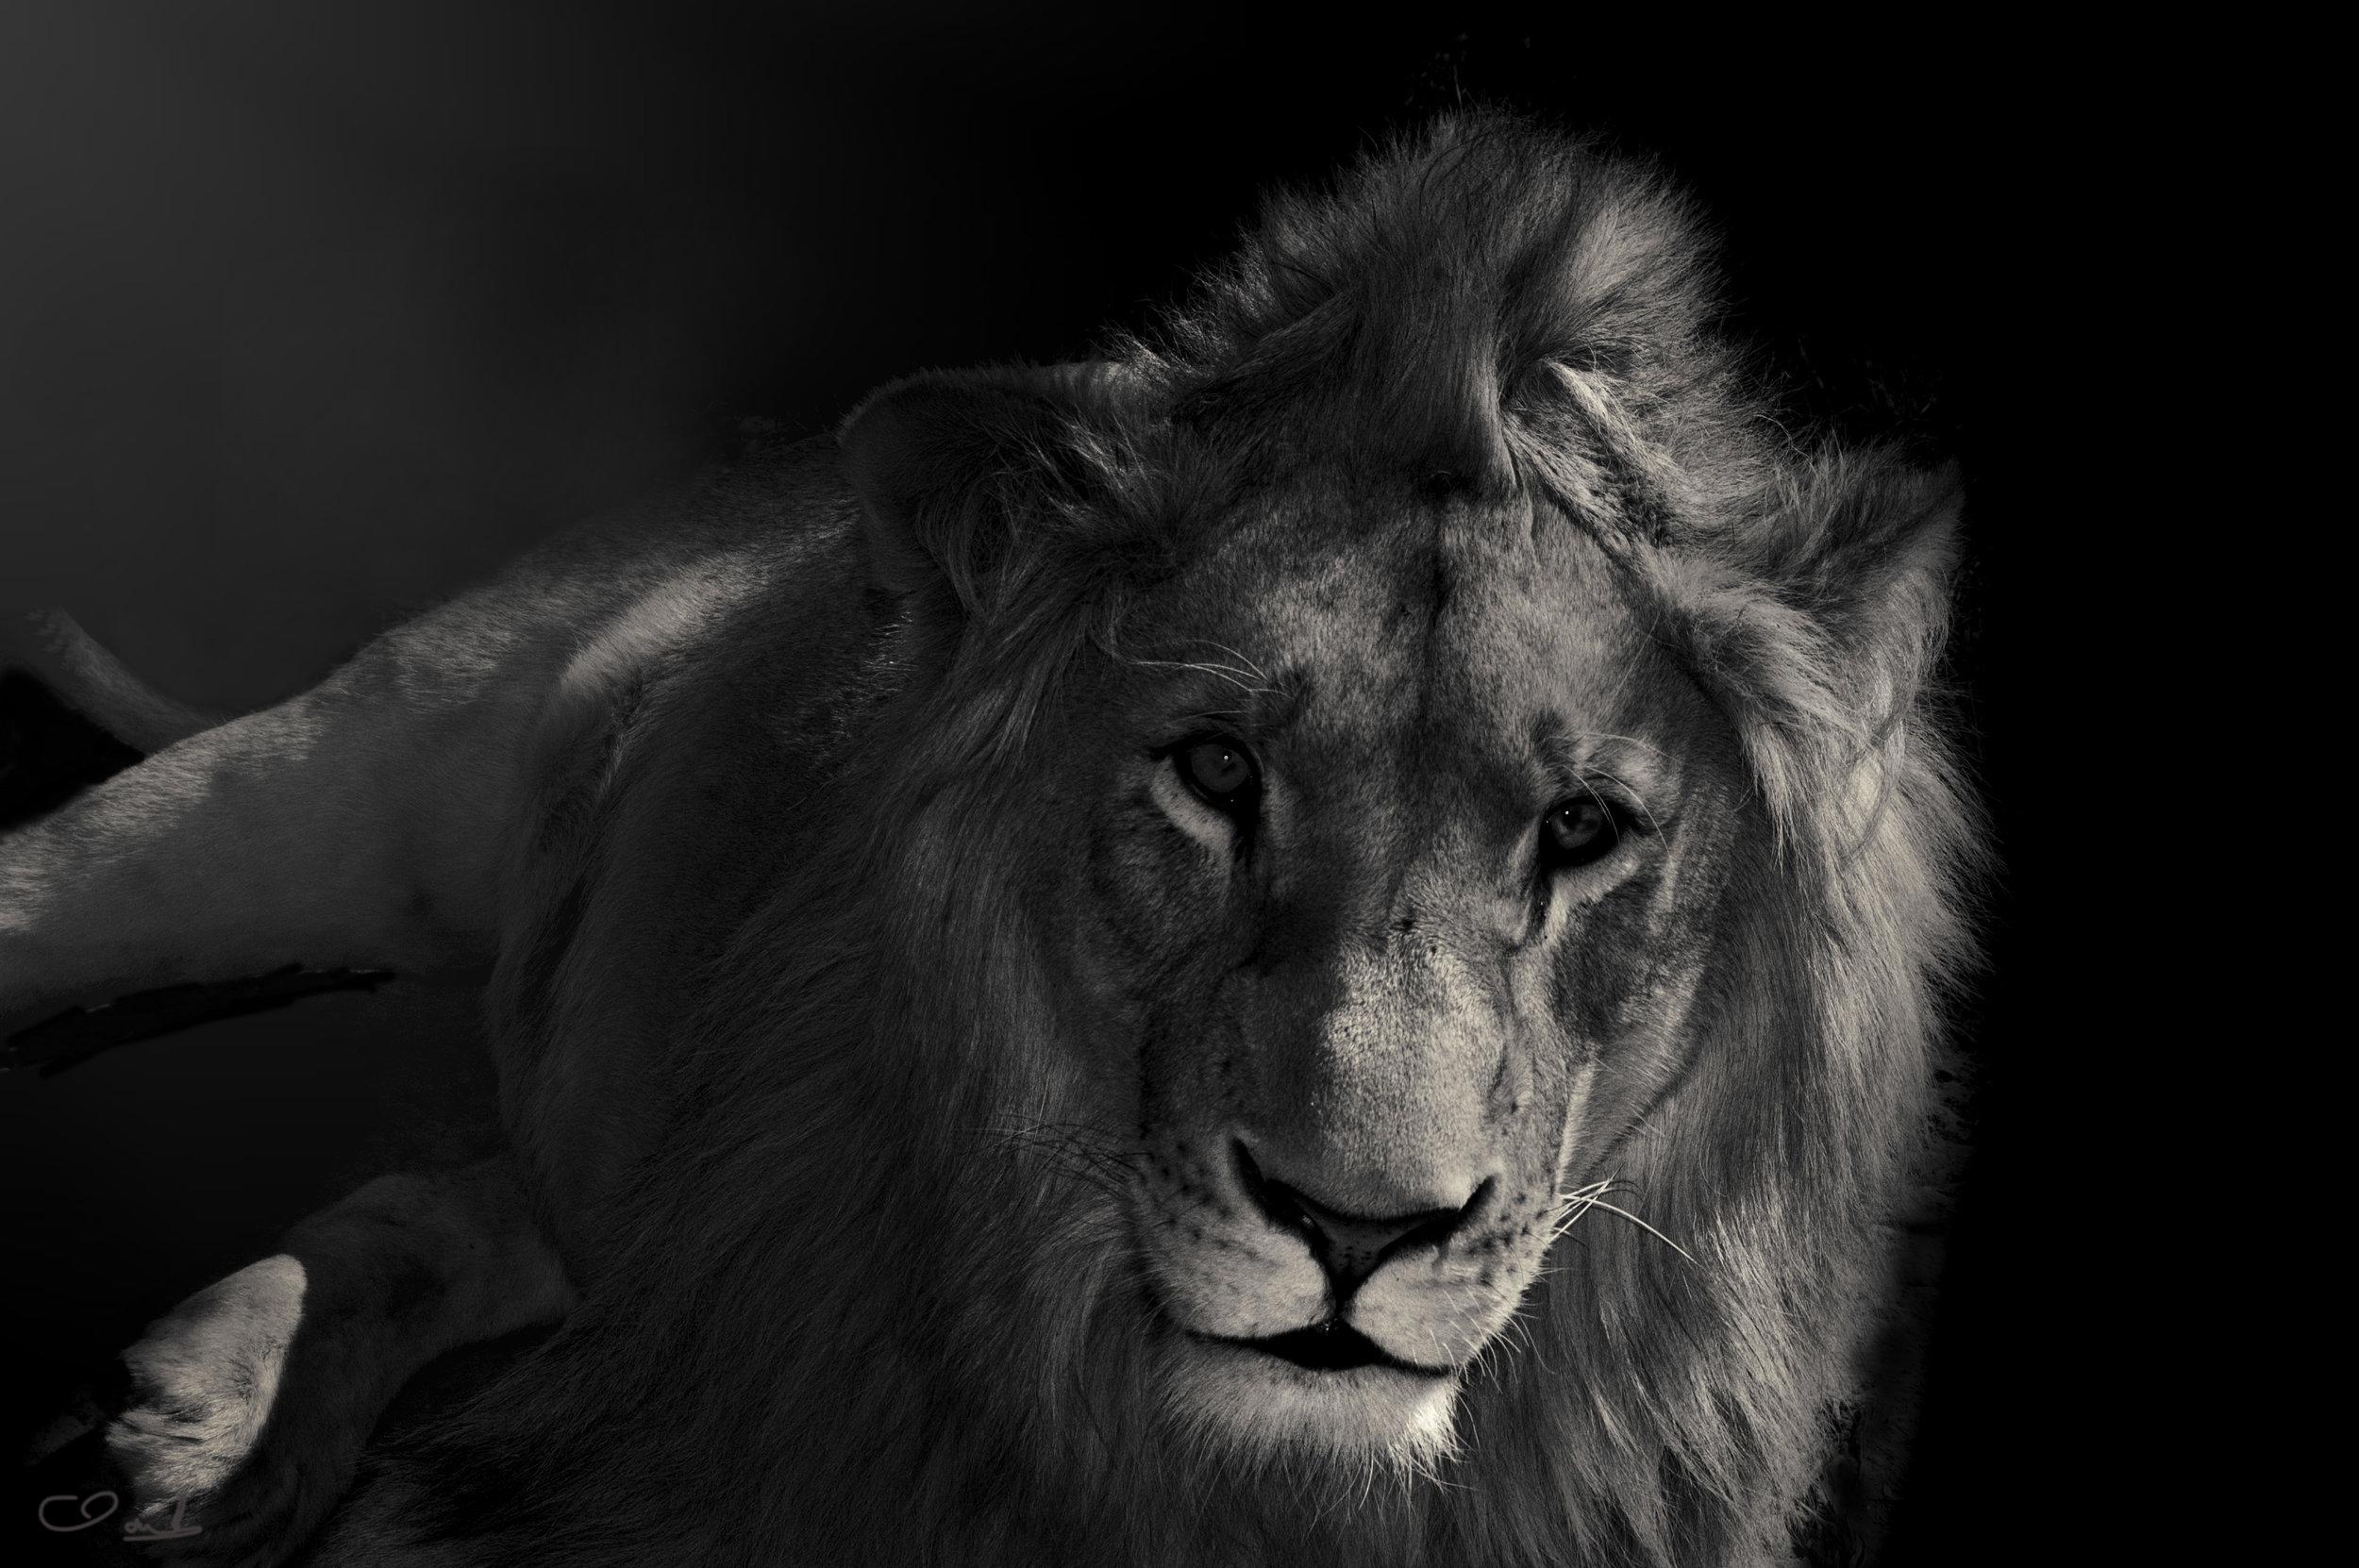 Kelan, SA, love lions alive sanctuary